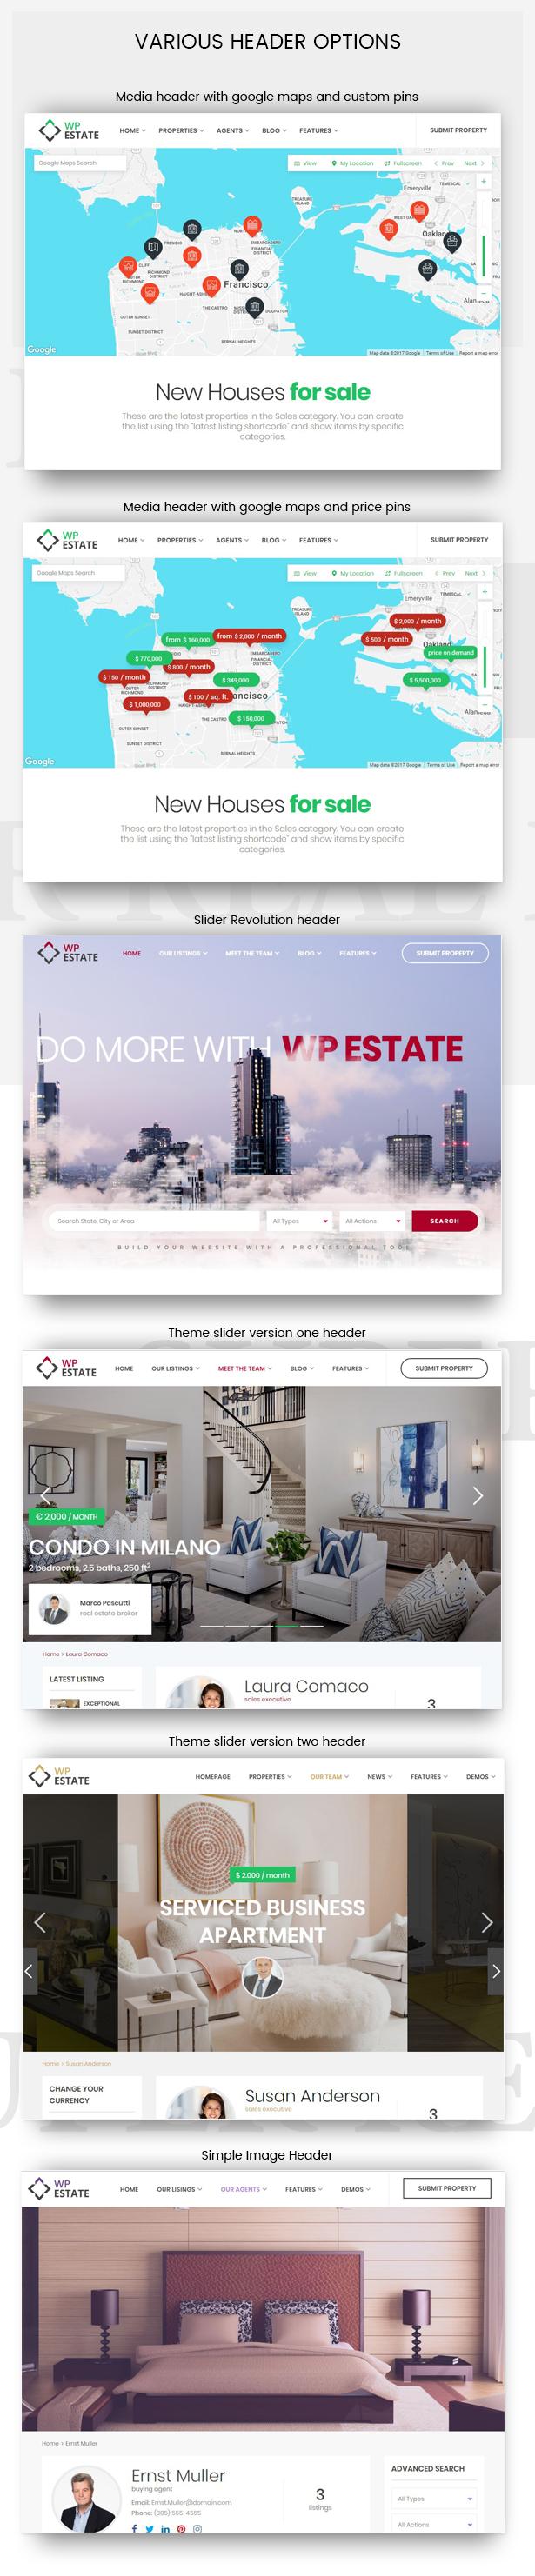 Real Estate - WP Estate Theme 5